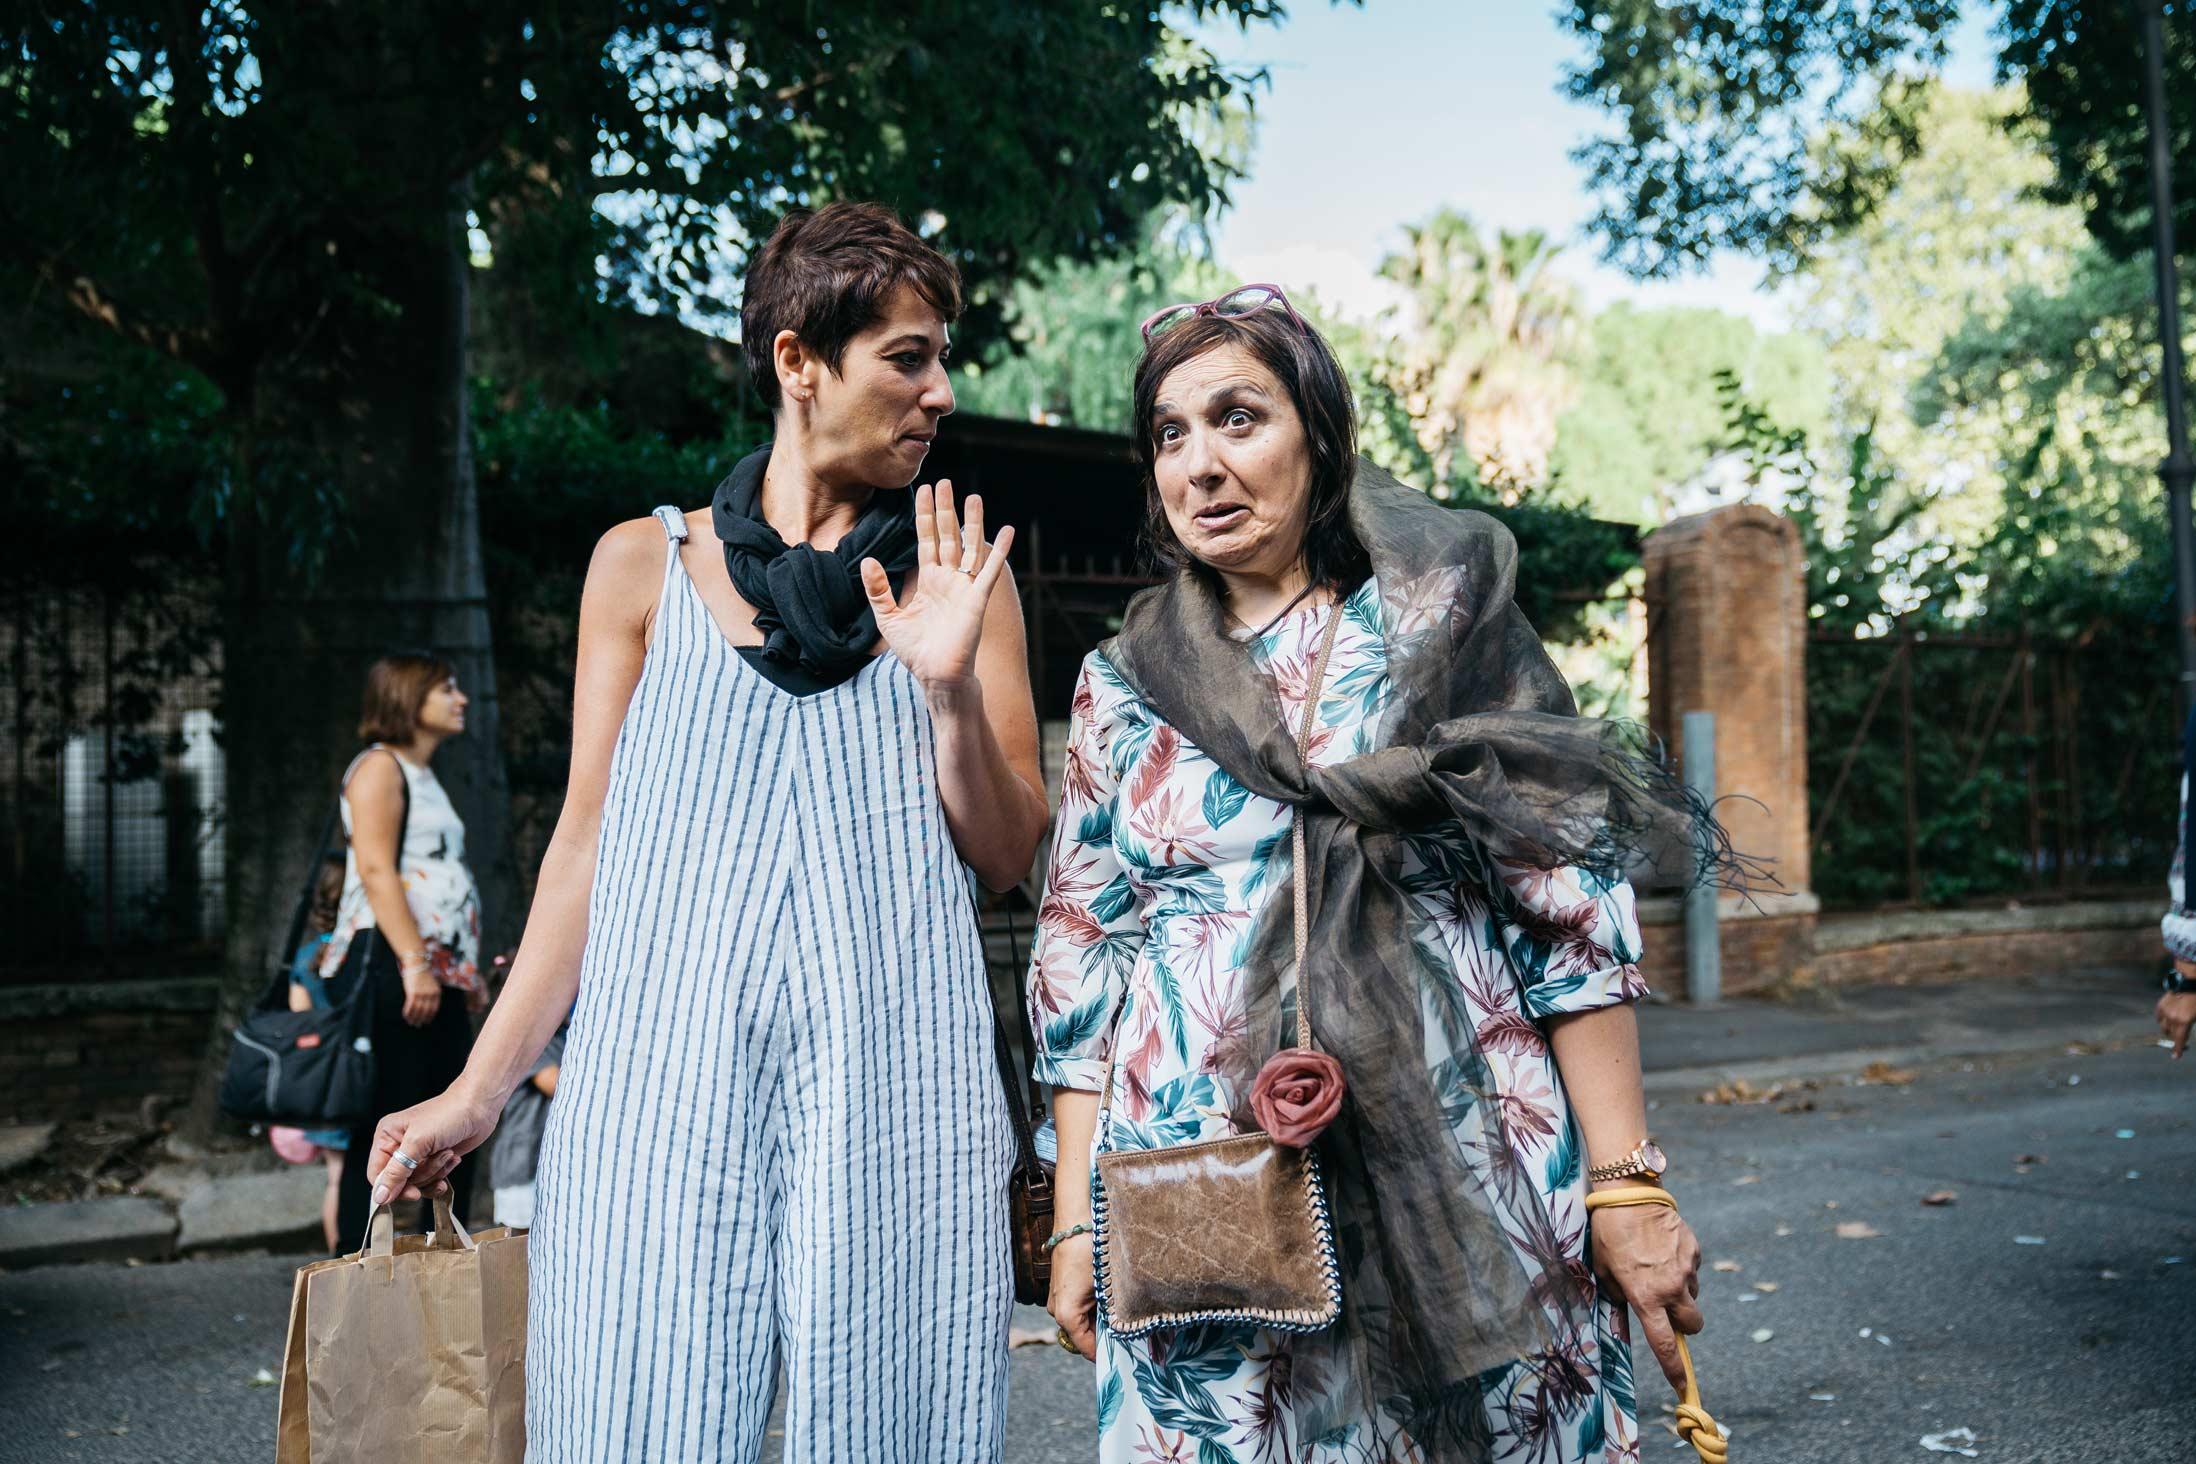 Fotografo-Matrimonio-Reportage-Roma-Cerimonia-1